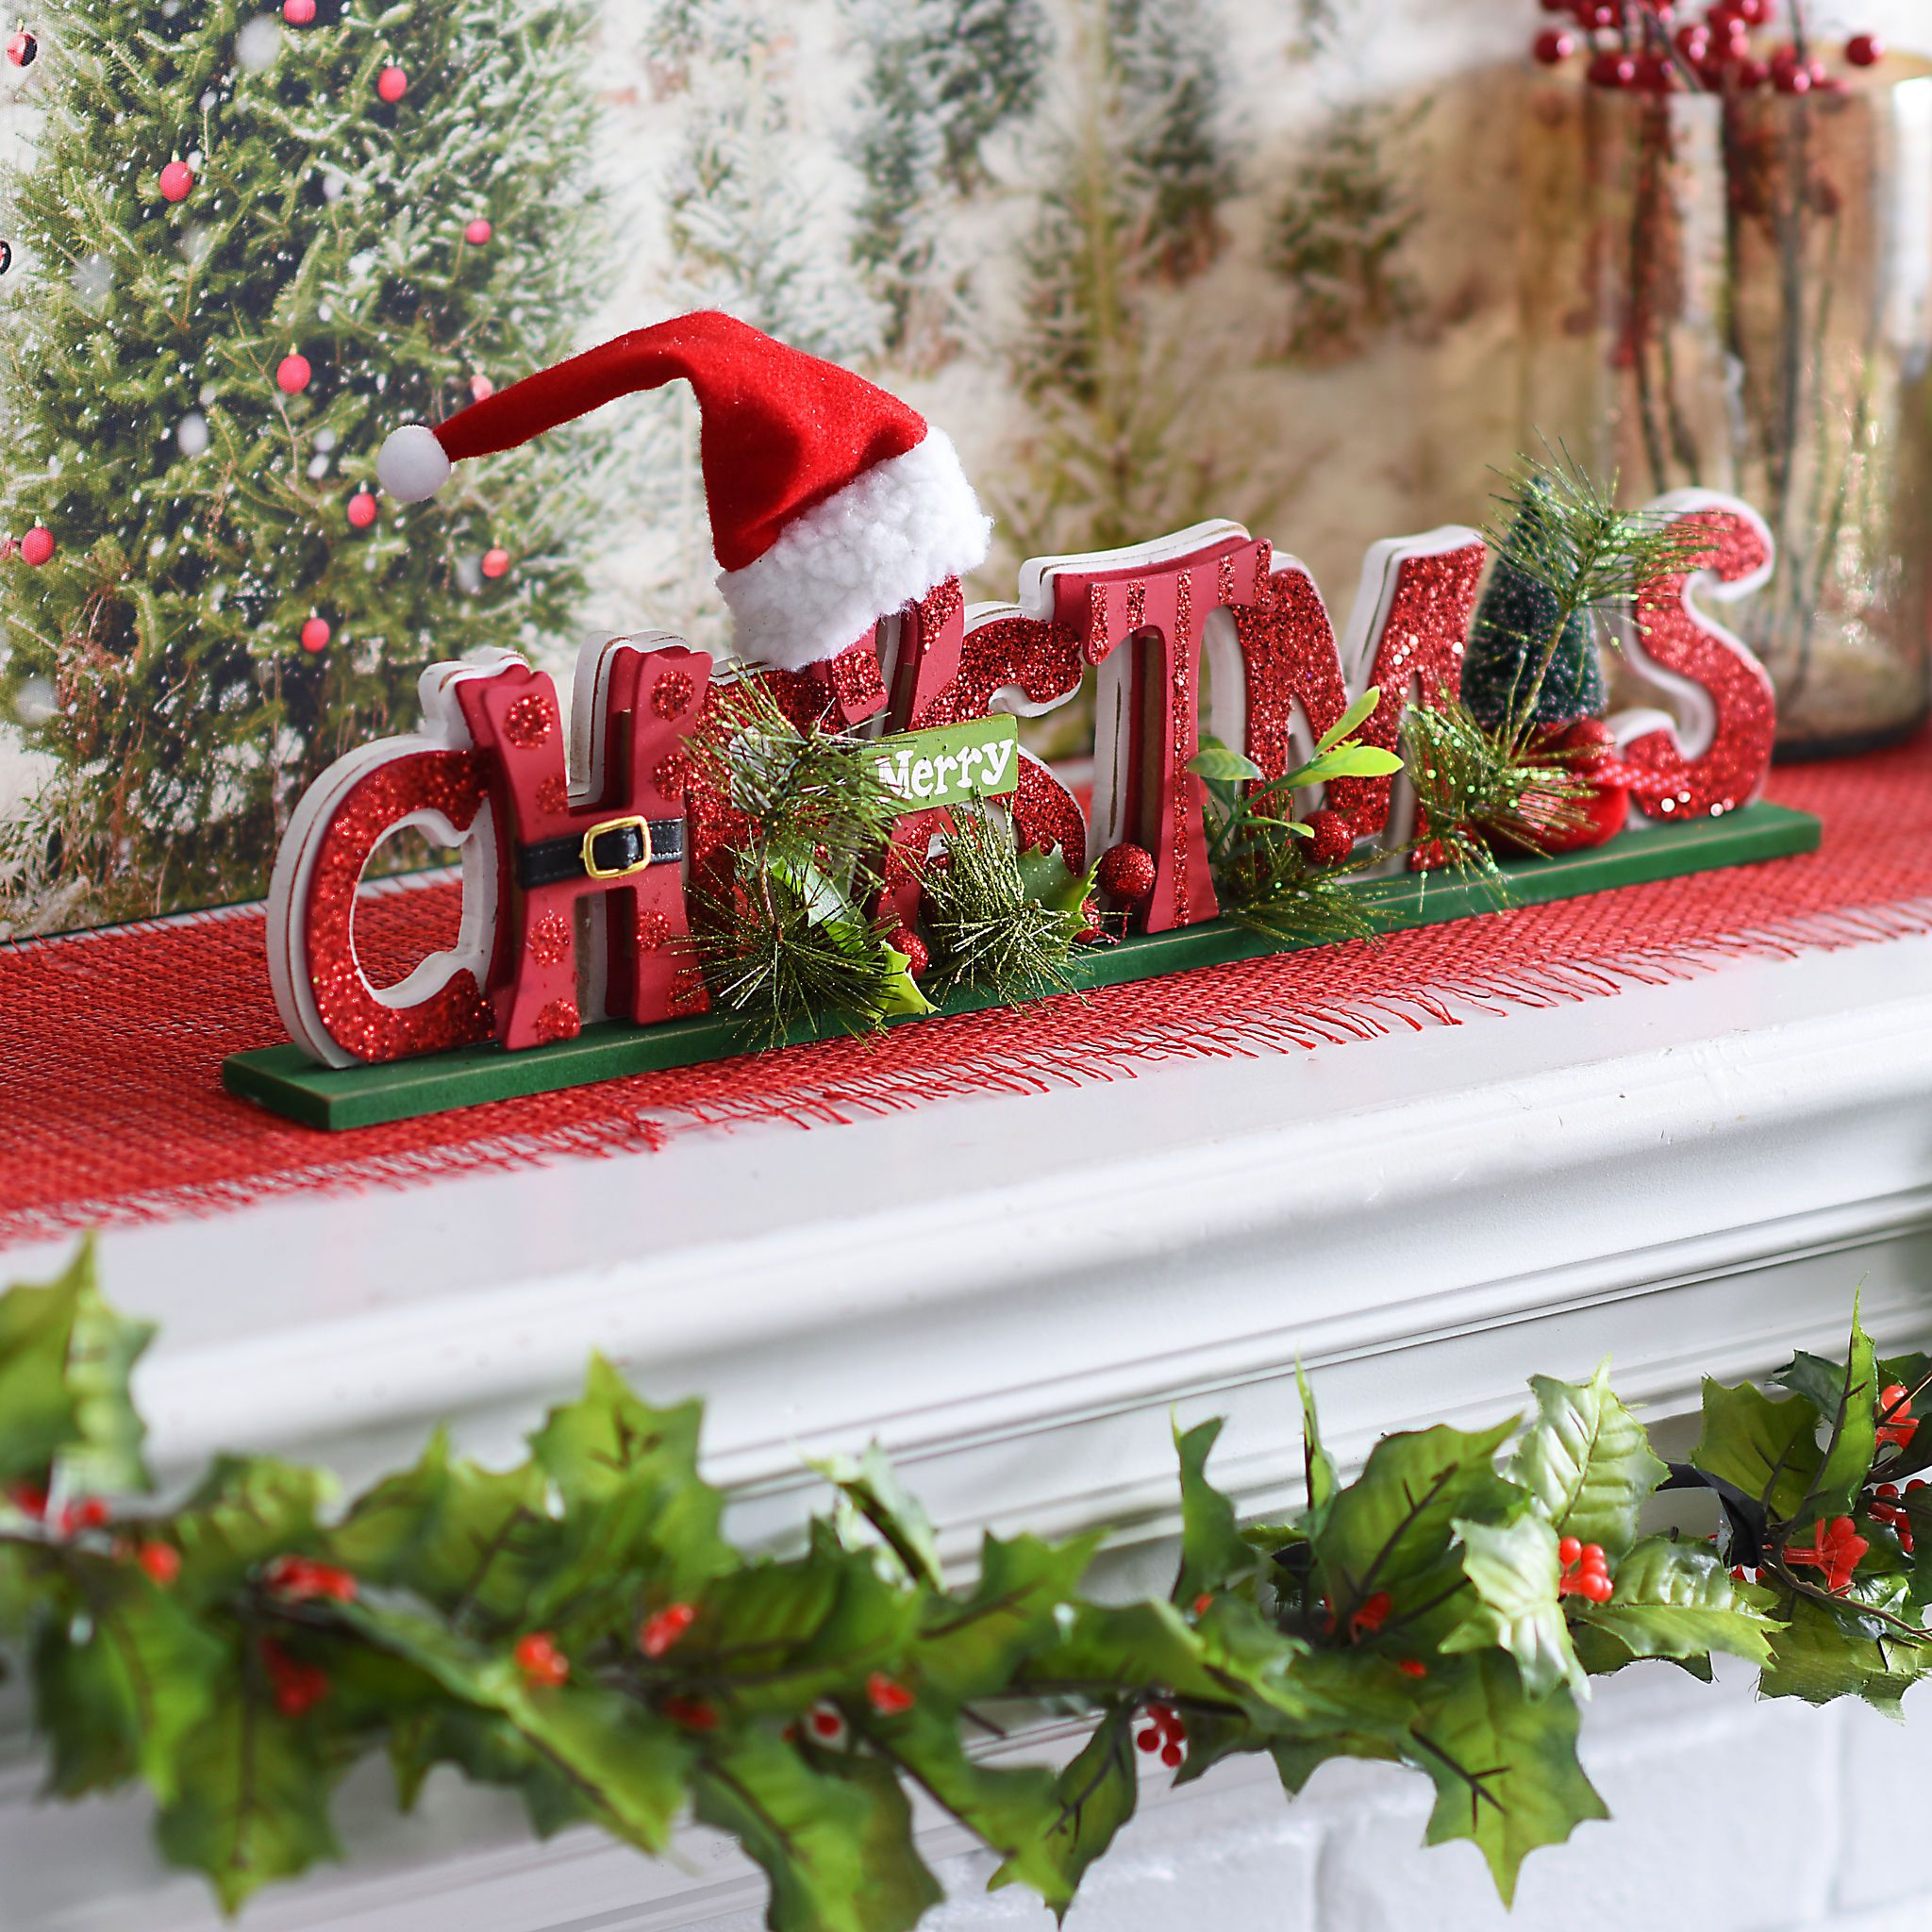 Cutout Merry Christmas Tabletop Sign | Christmas tabletop, Tabletop ...